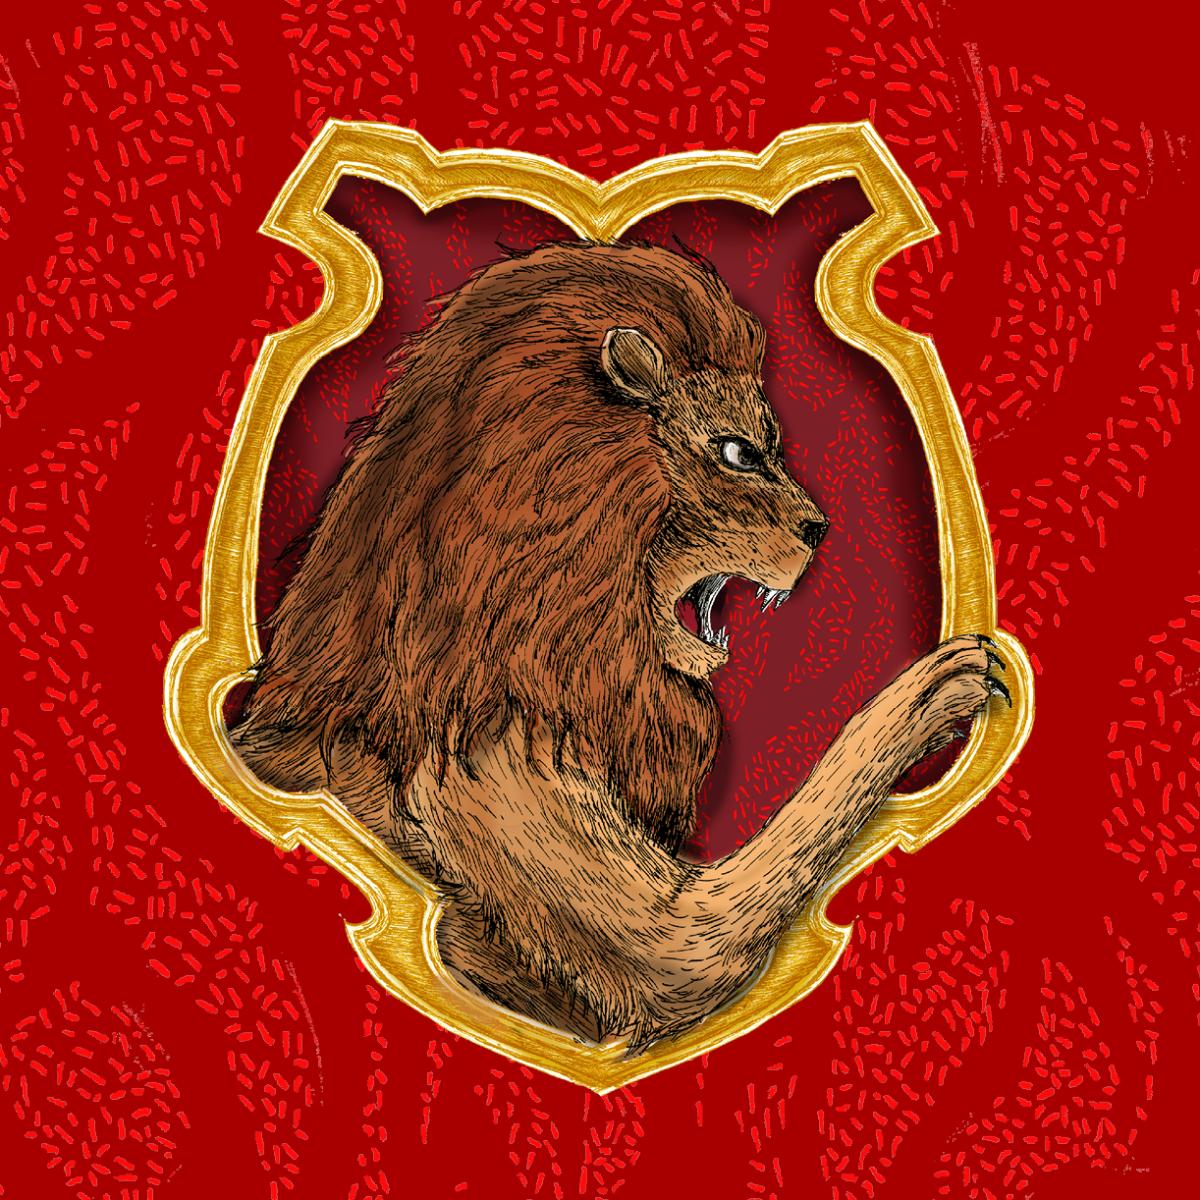 Pottermore Hogwarts Houses Gryffindor Harry Potter Quiz Hogwarts Houses Gryffindor